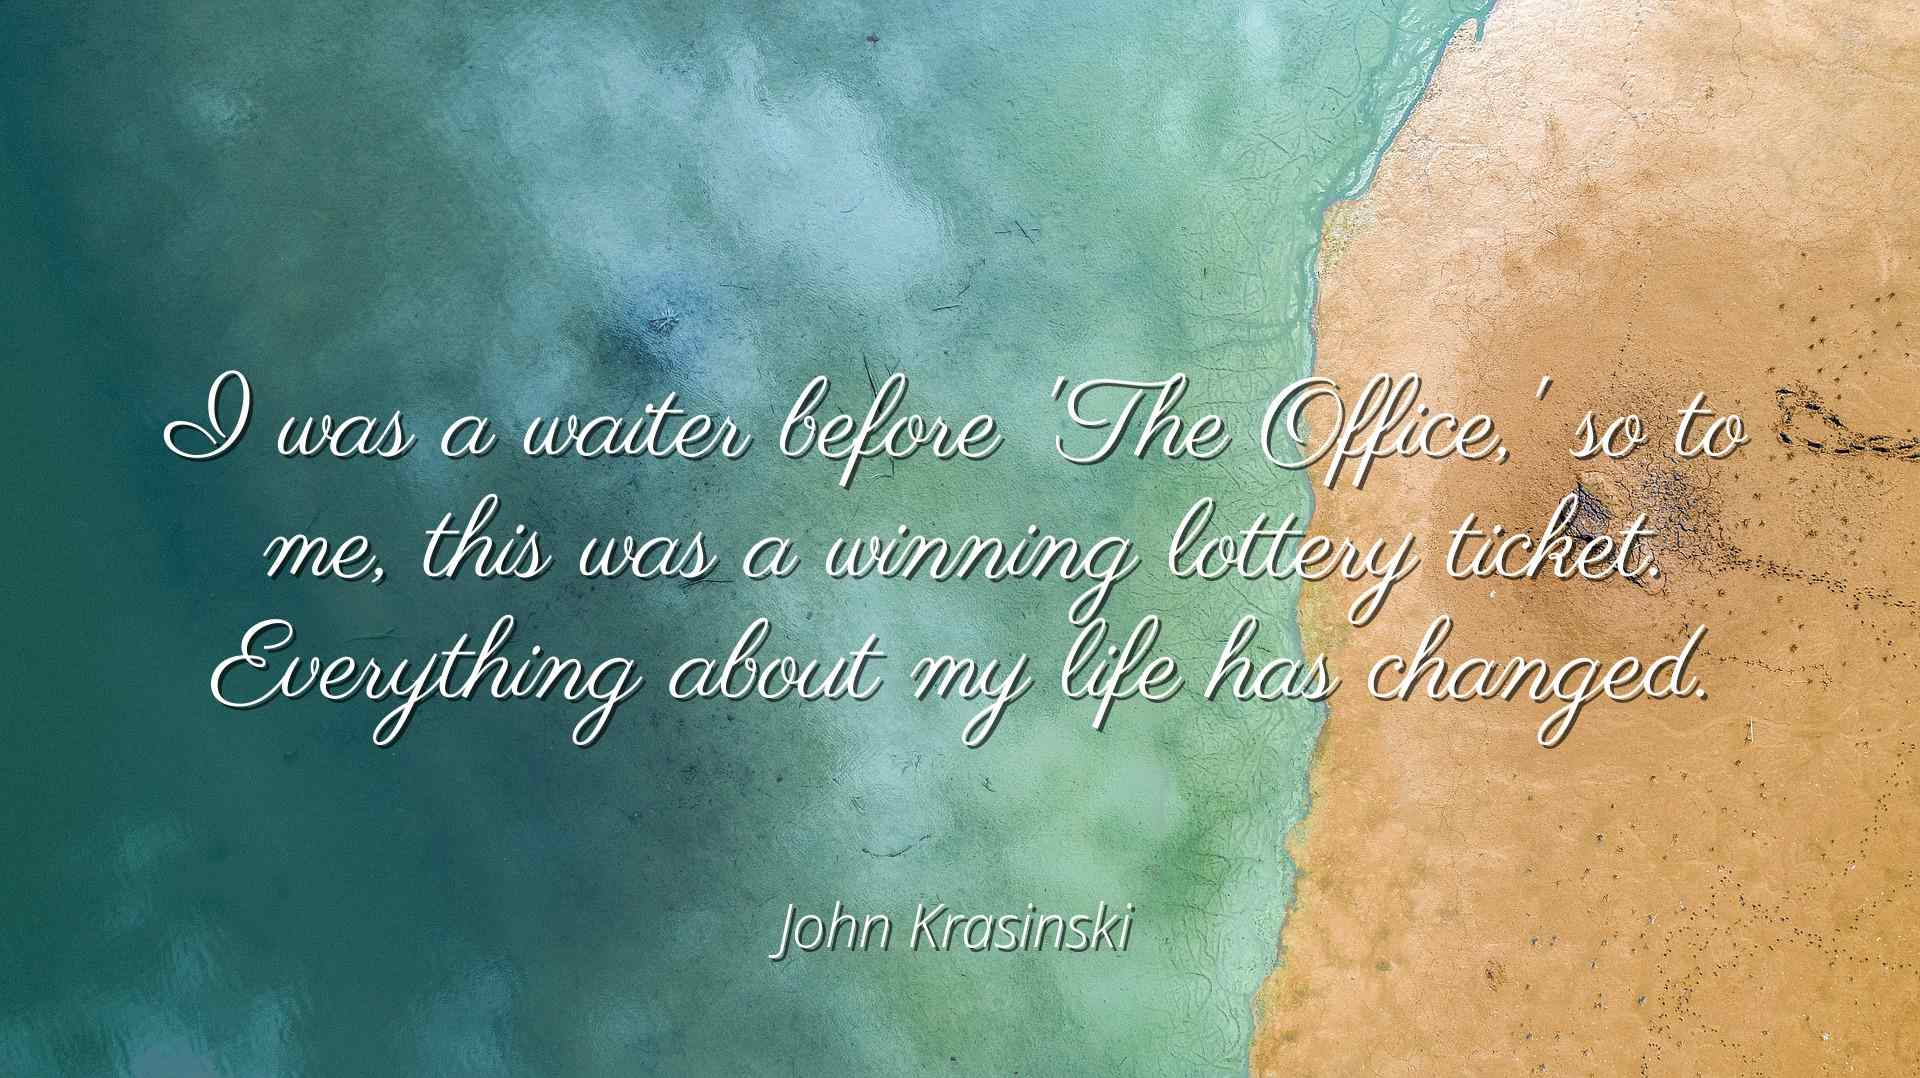 John Krasinski I Was A Waiter Before The Office So To Me This